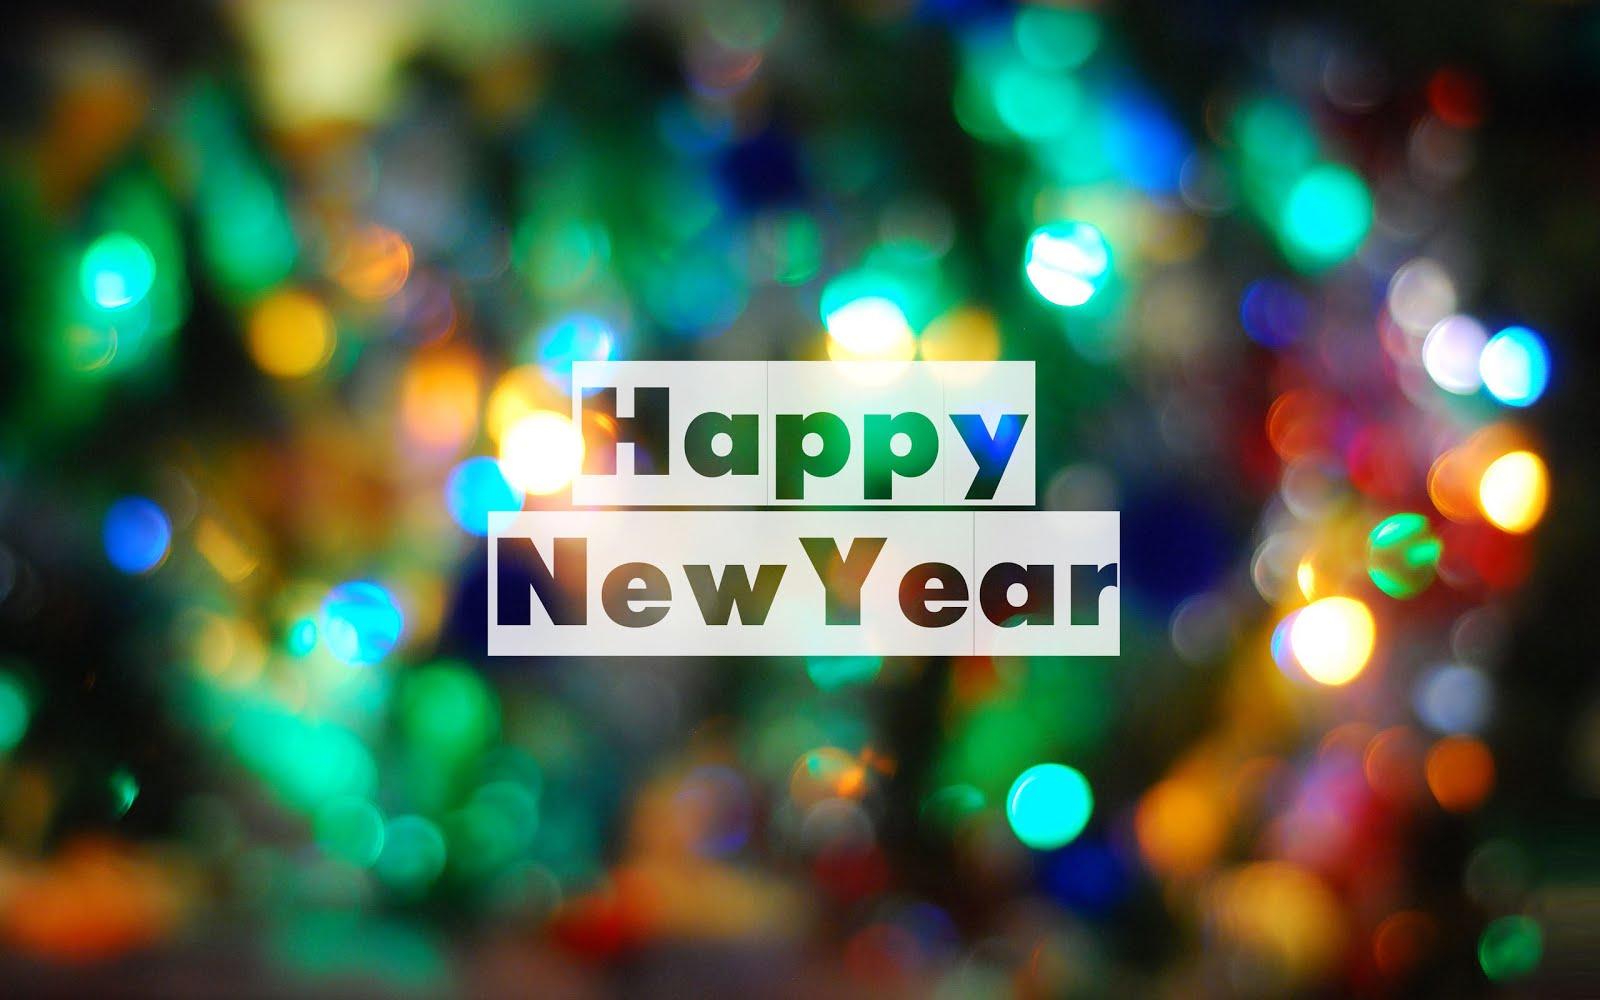 Happy New Year 2014 6933461 1600x1000